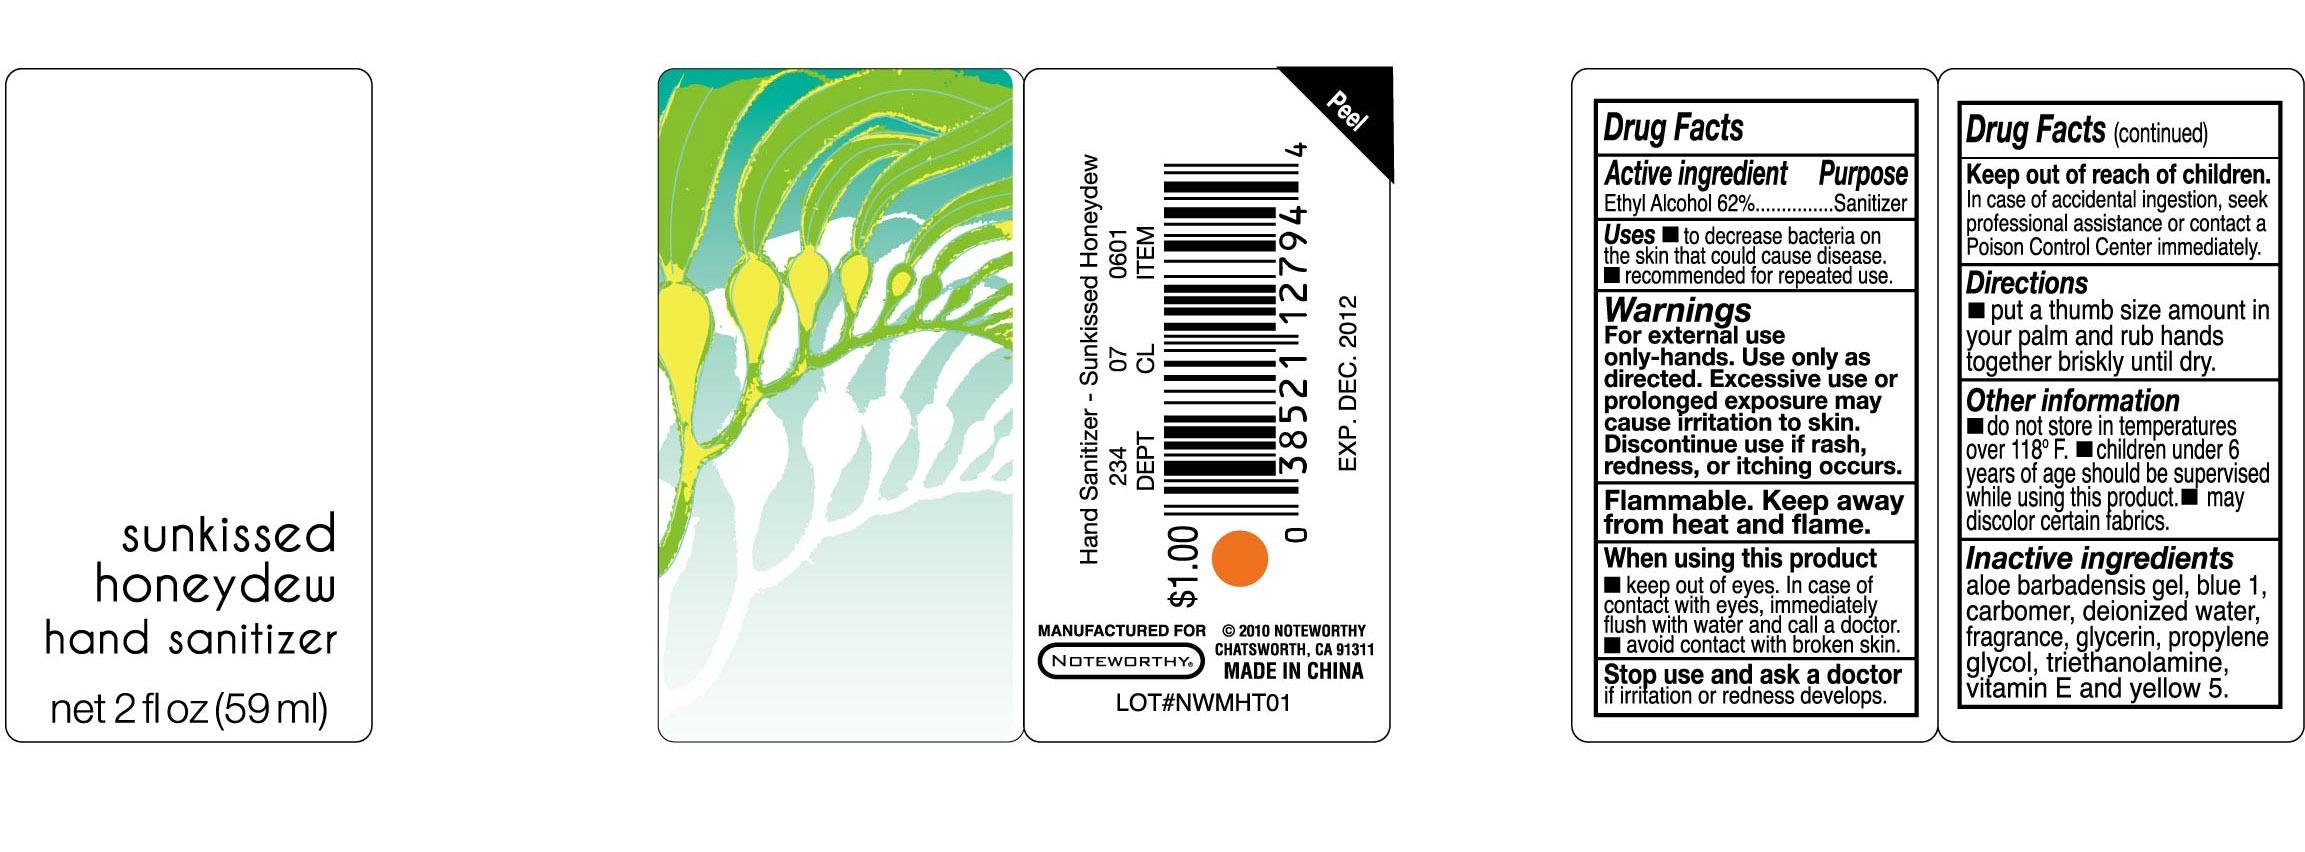 Sunkissed Honeydew Hand Sanitizer (Alcohol) Liquid [Unique Holding Group Inc]